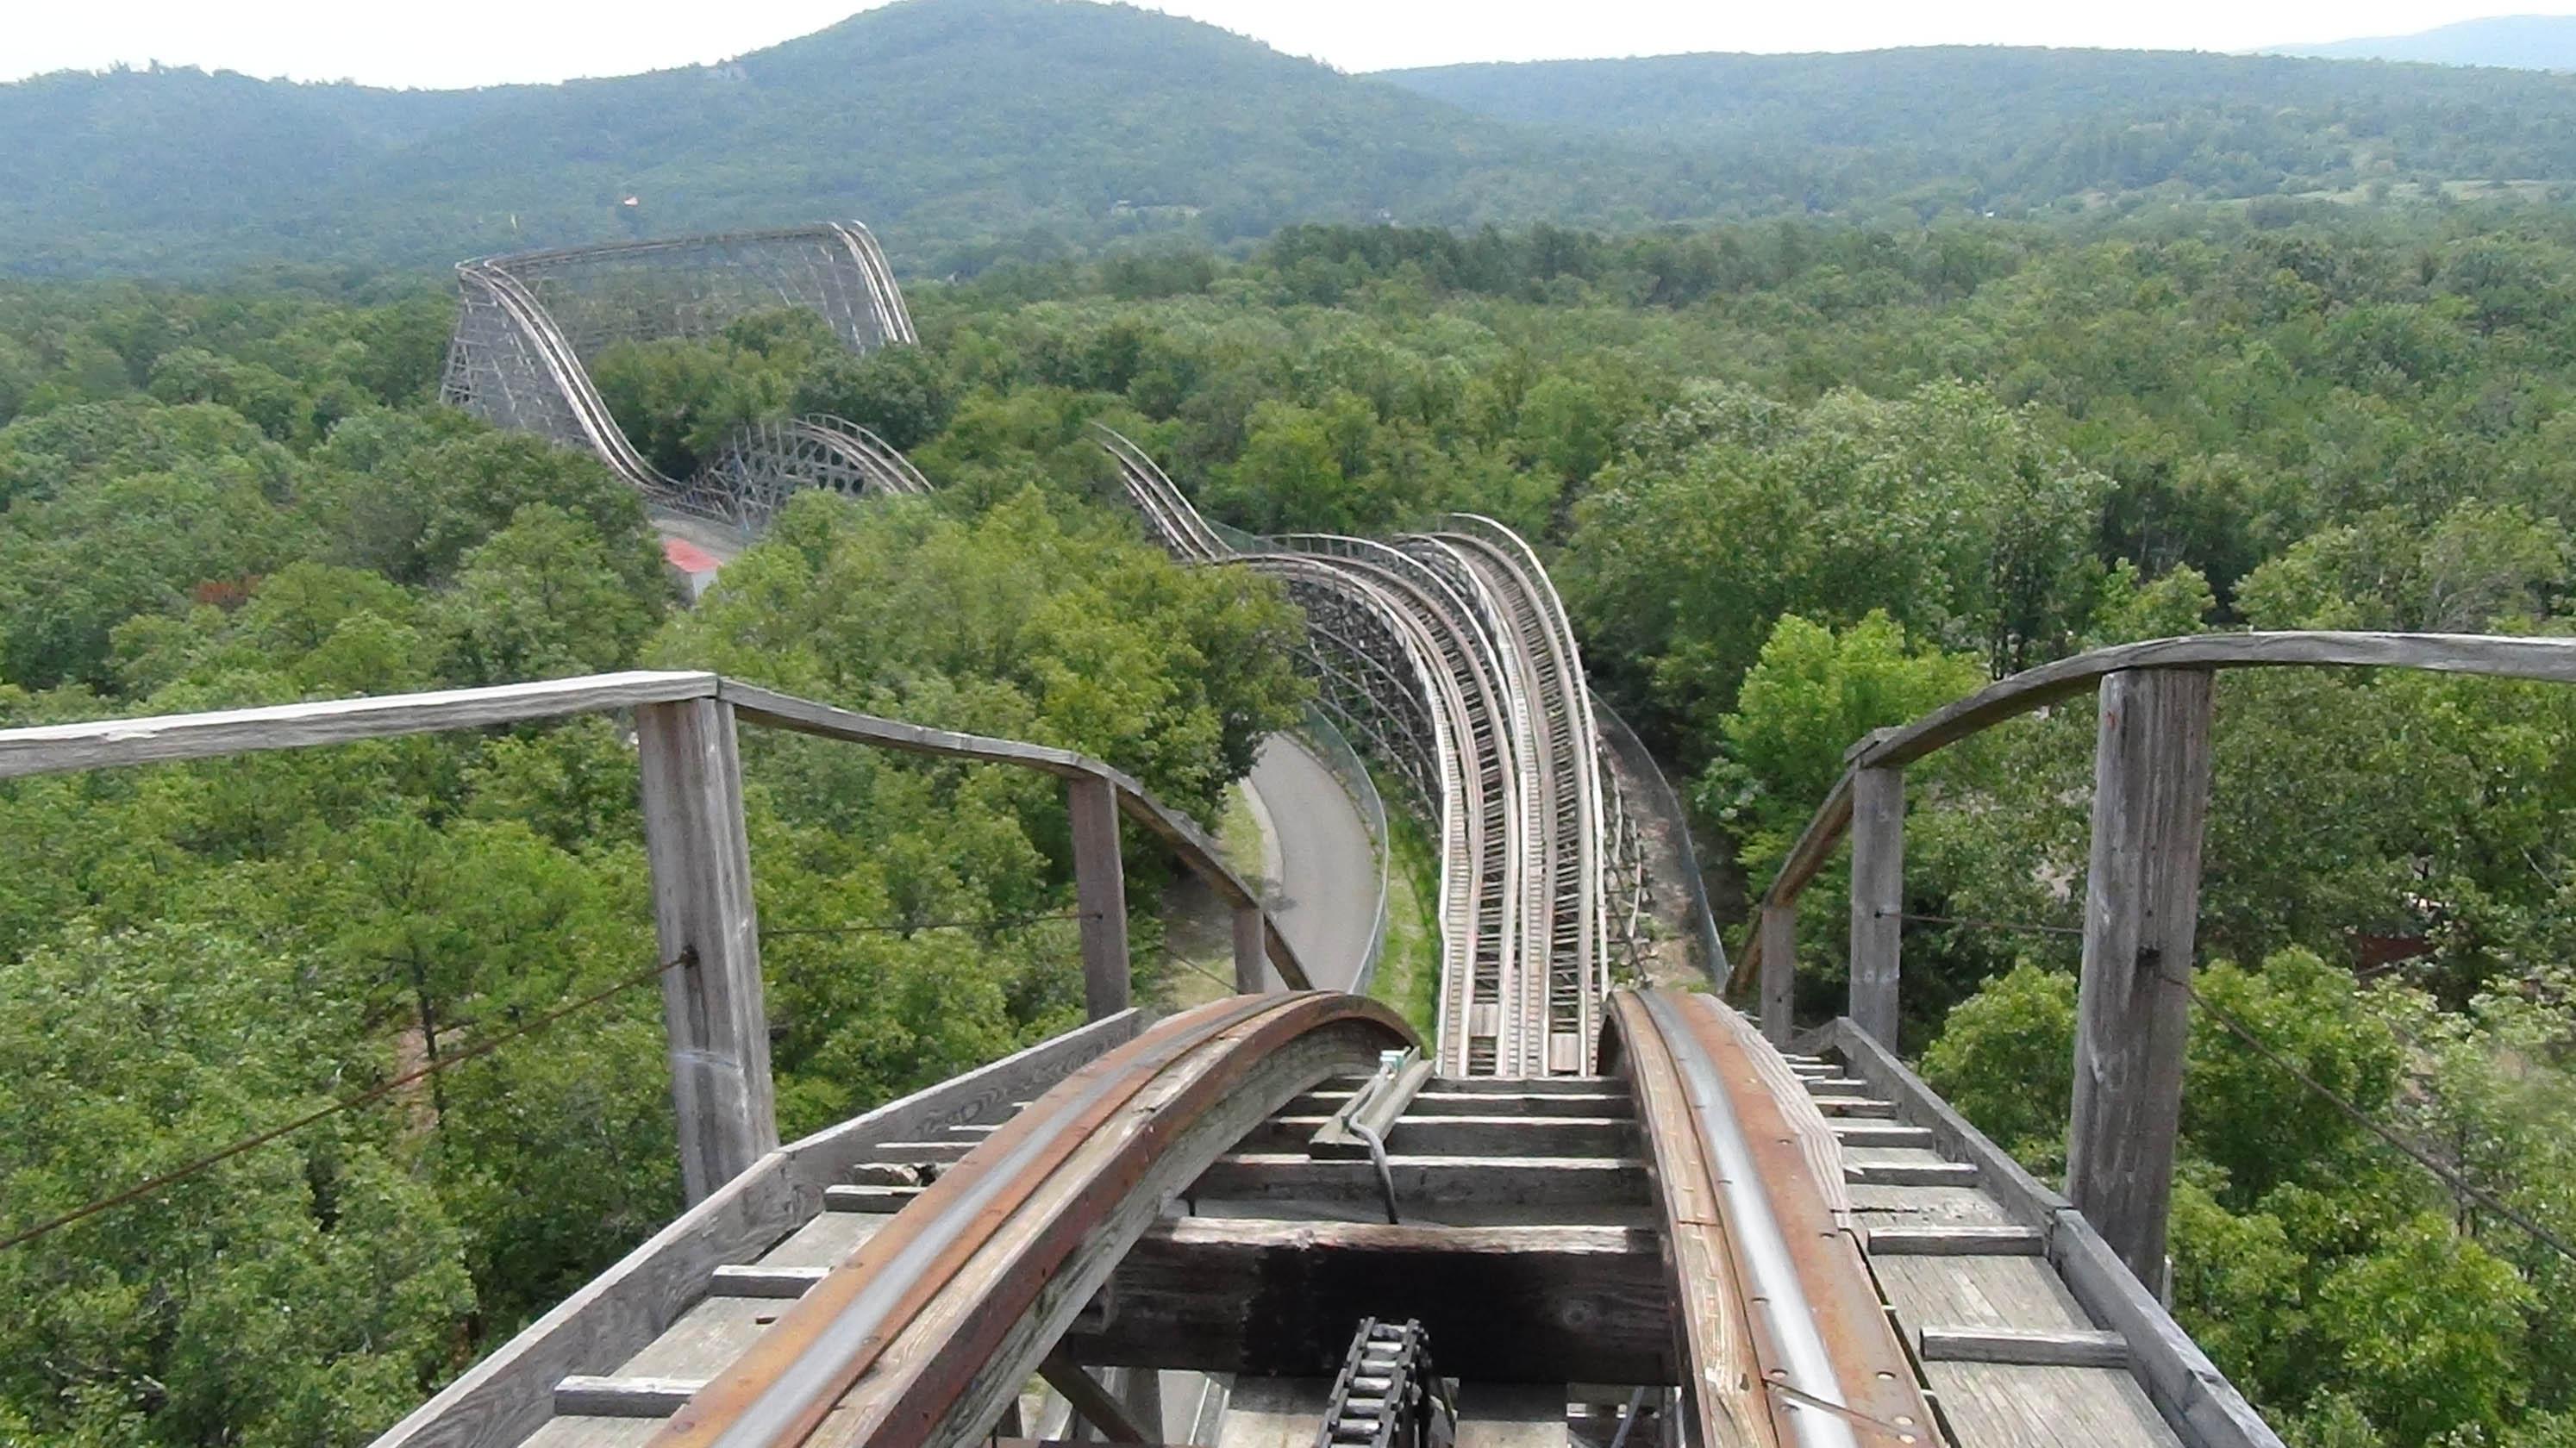 Magic Springs Crystal Falls Arkansas Twister